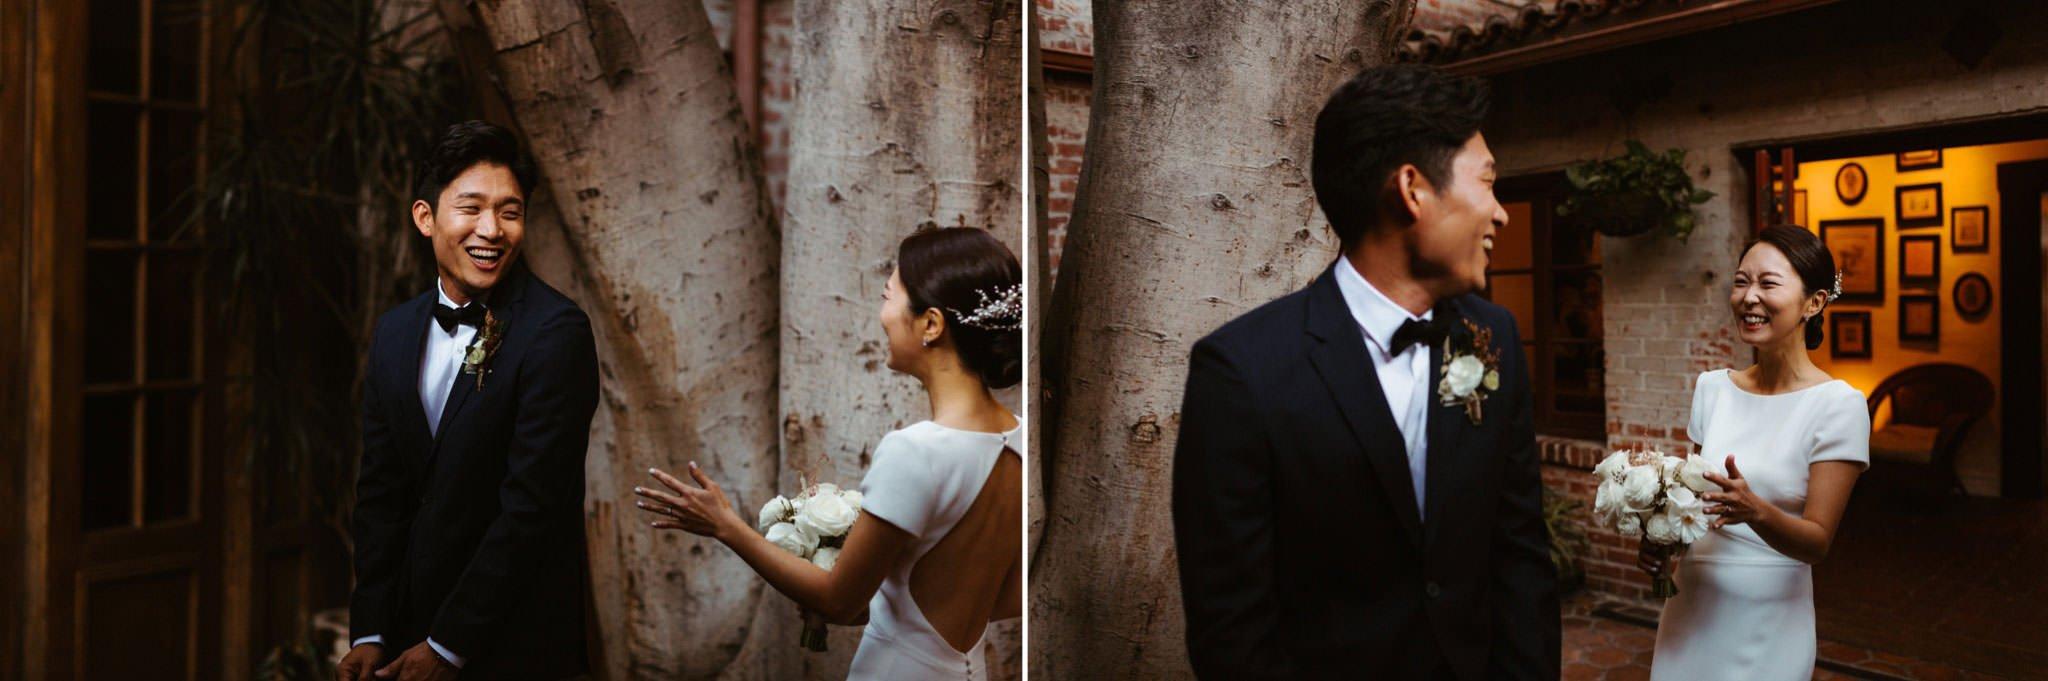 carondelet house wedding 033